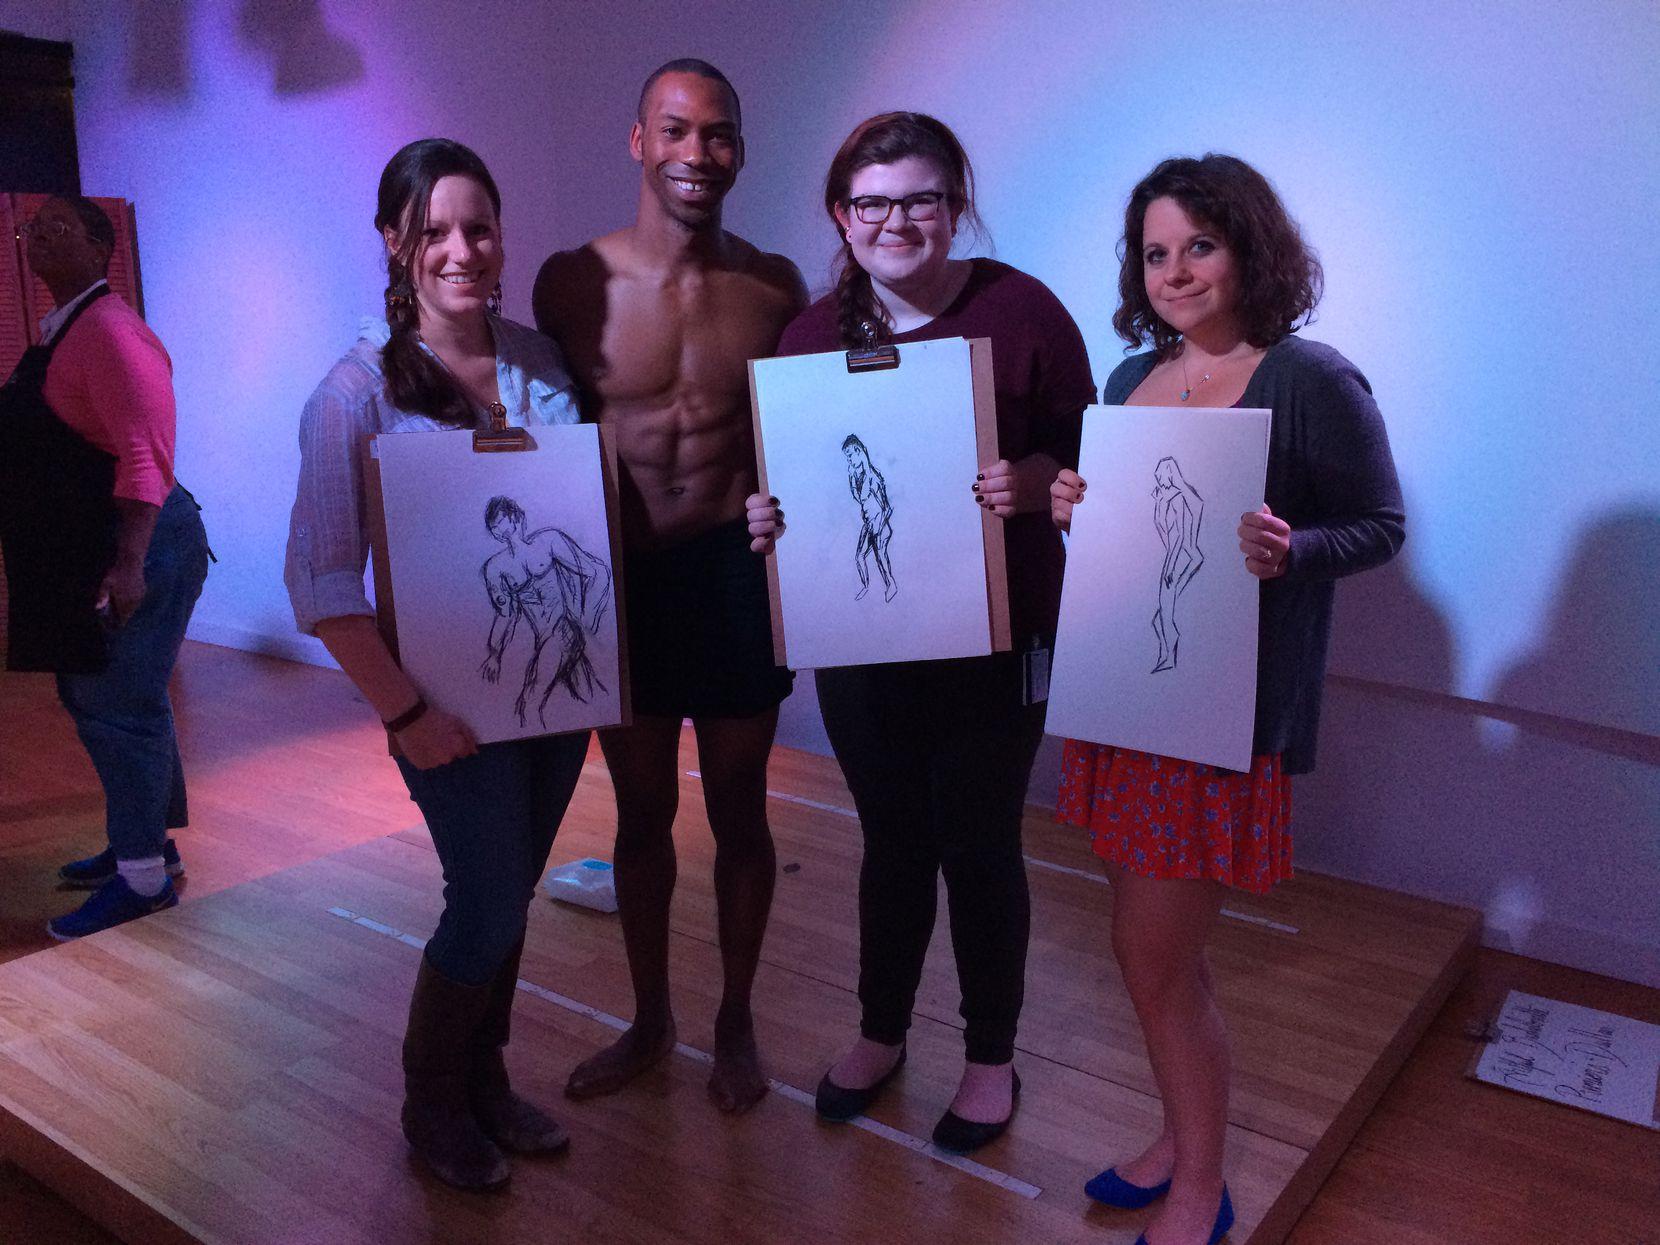 From left: Tiney Ricciardi, master male model Kenny, Hannah Wise and Brentney Hamilton.